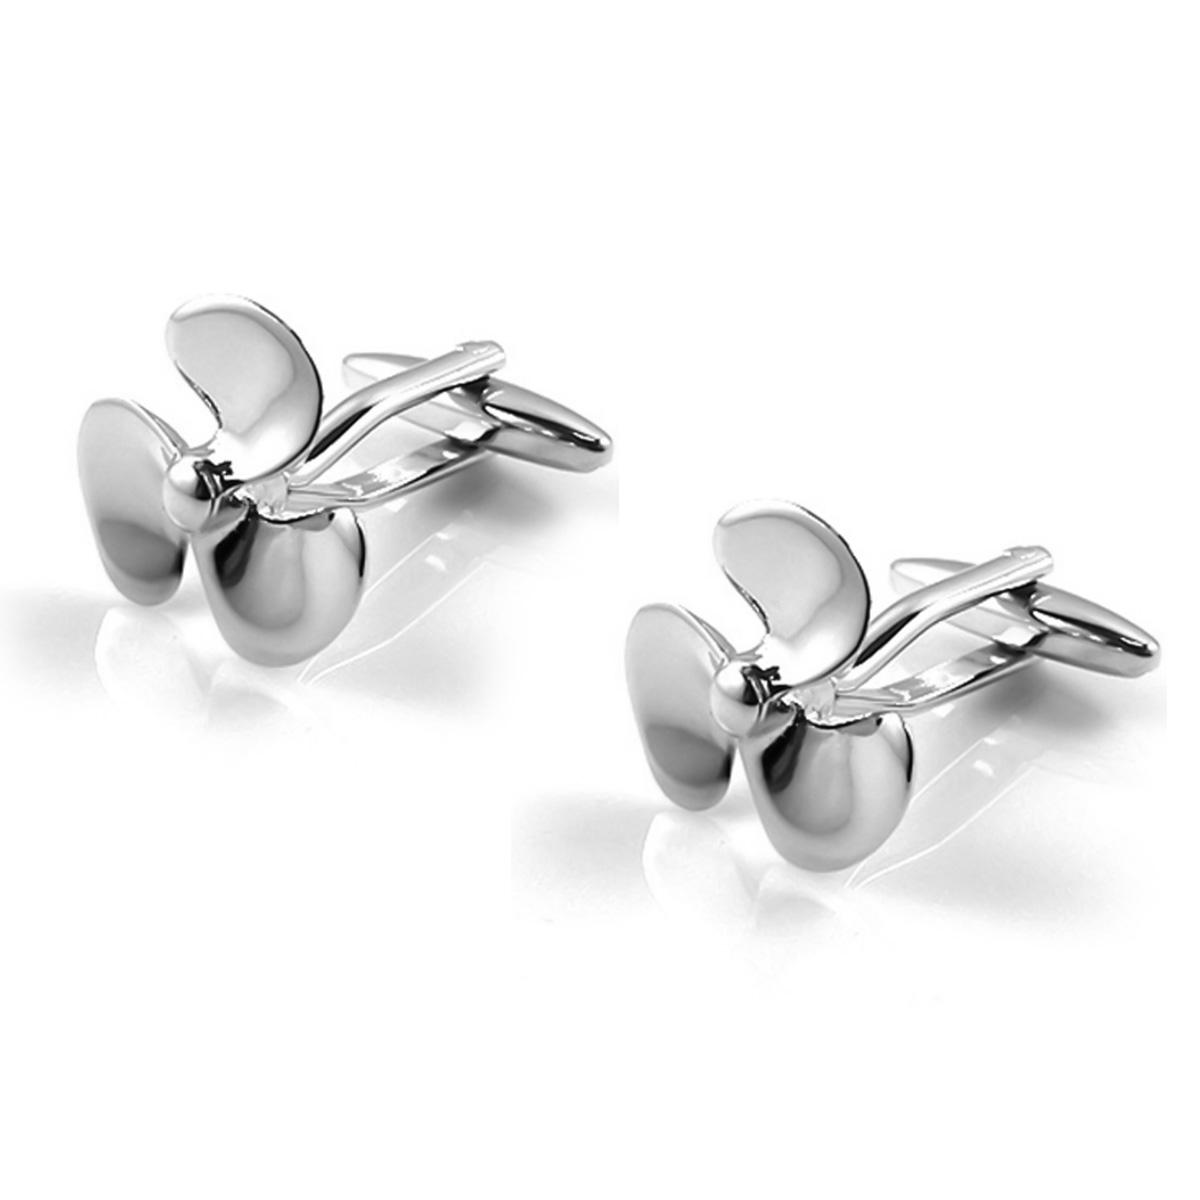 Gunmetal and Silver Propellor Cufflinks